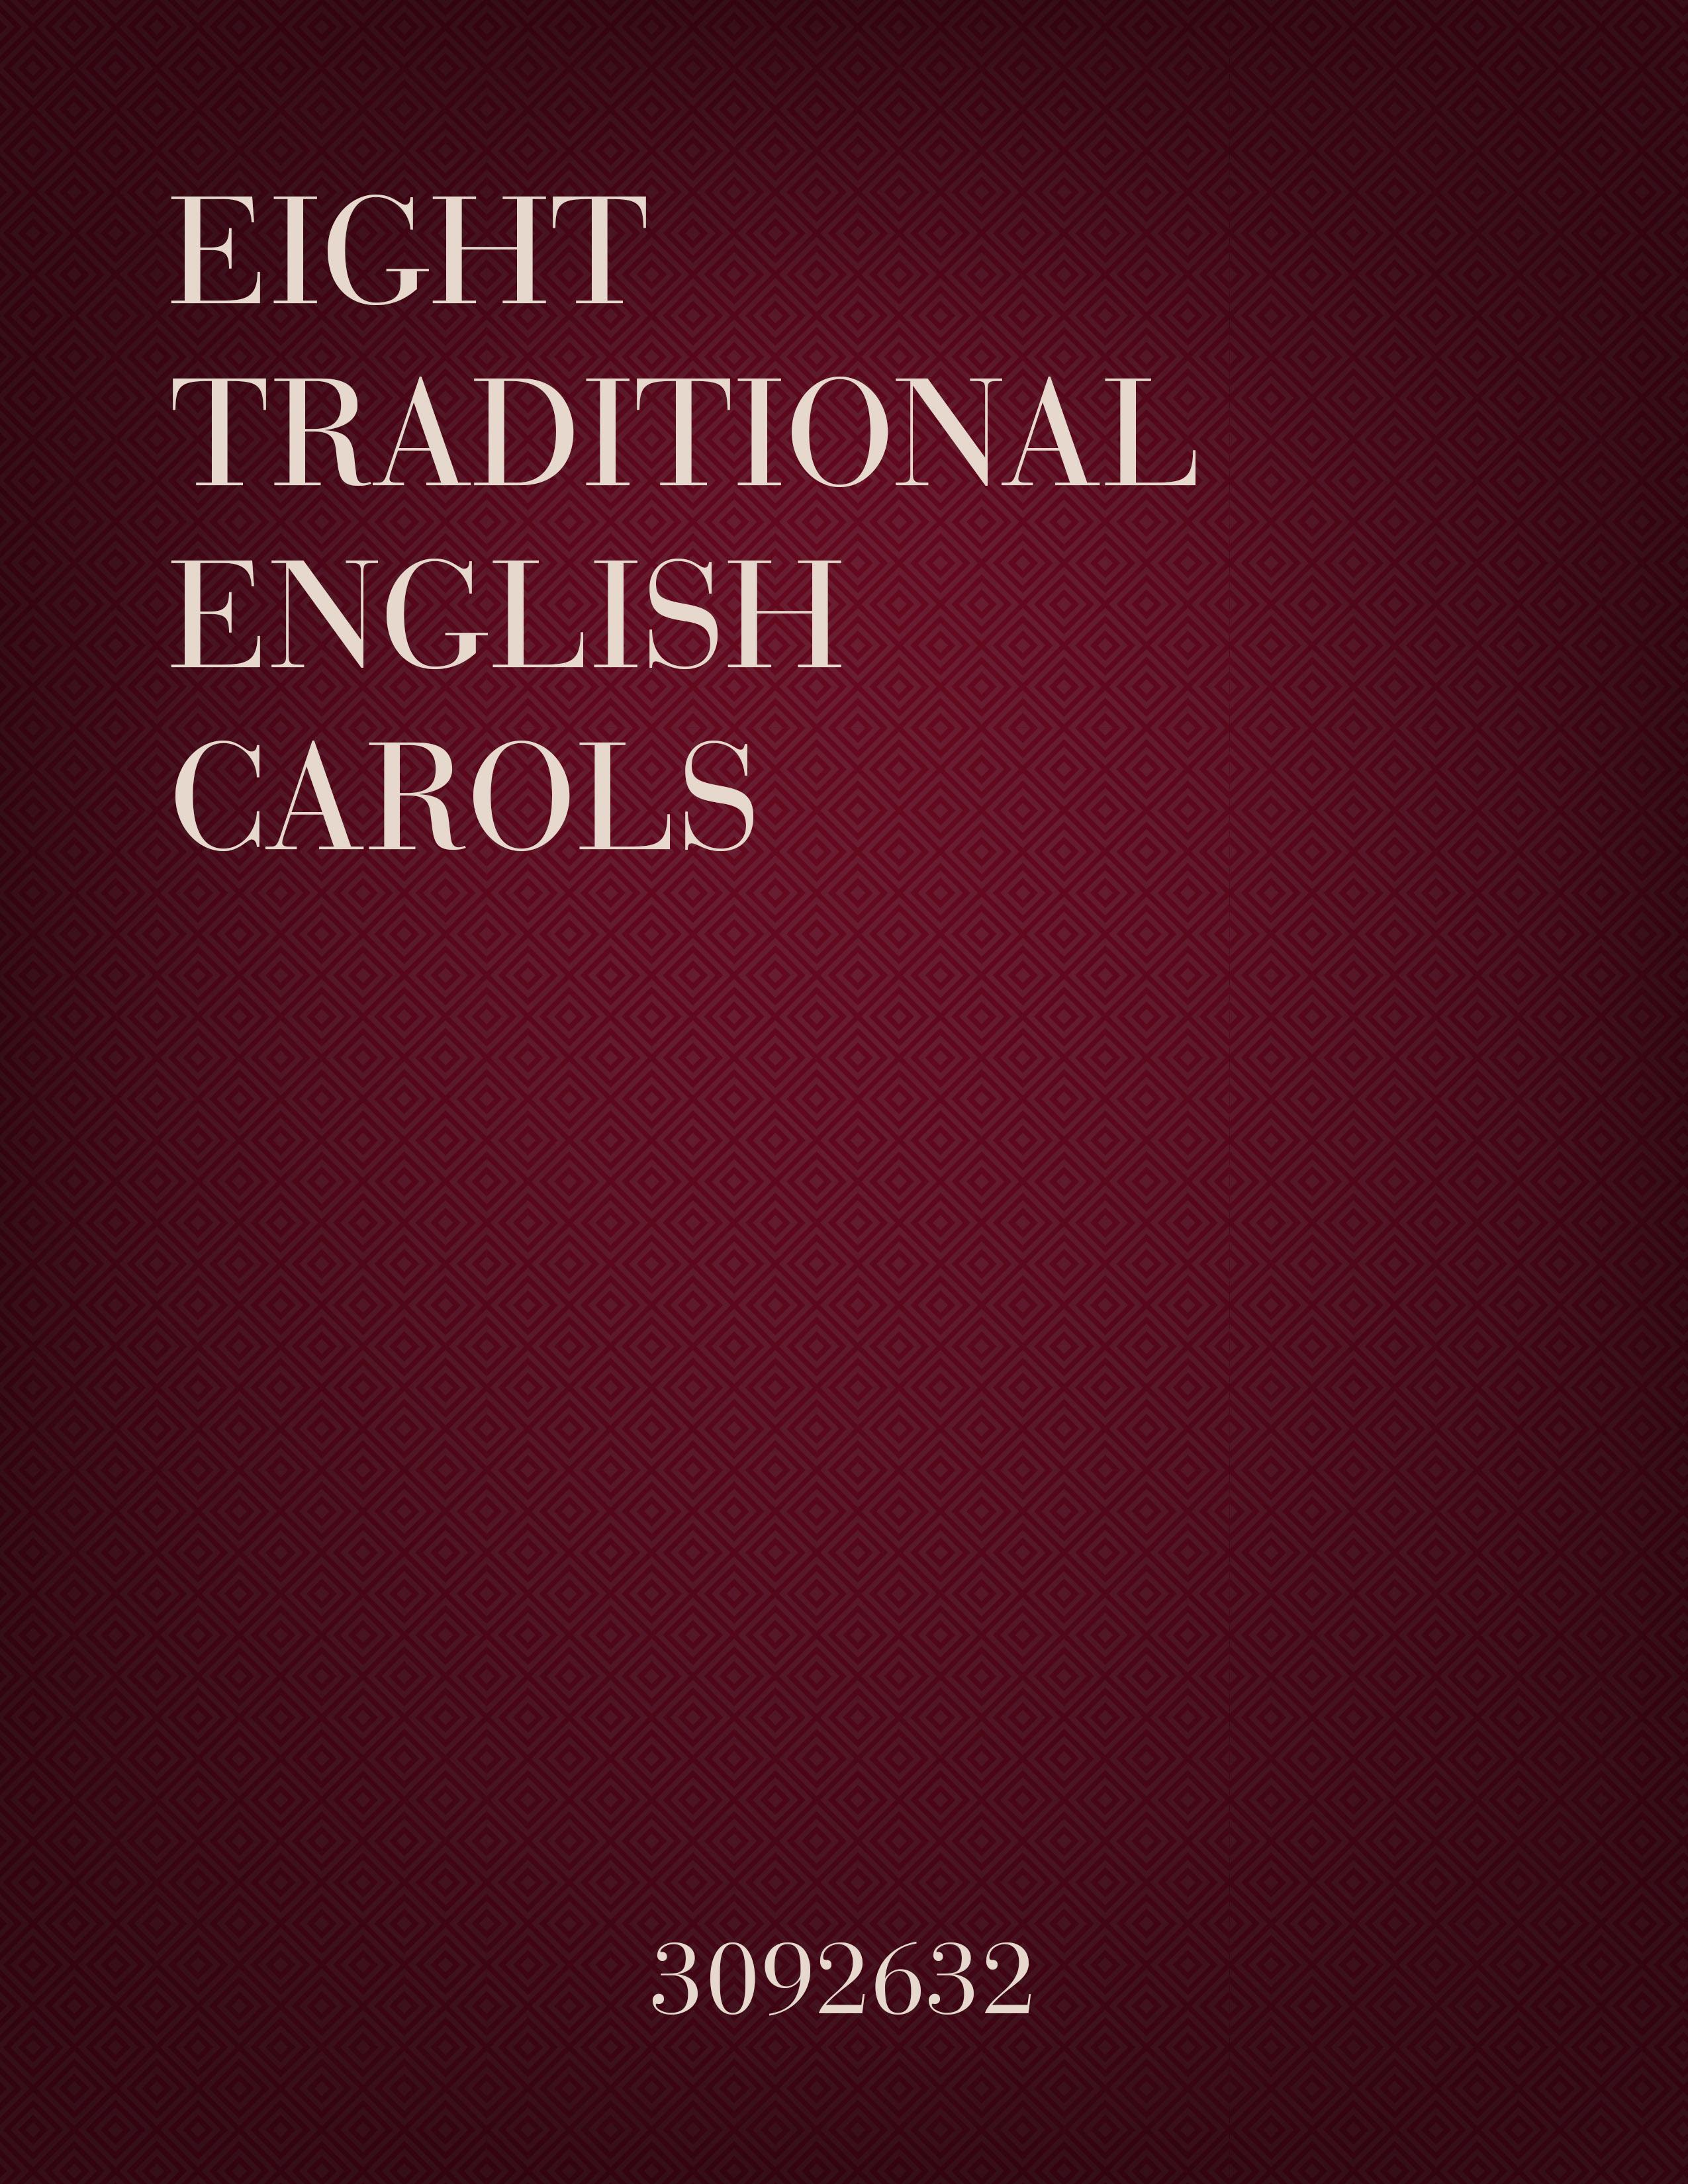 Eight Traditional English Carols